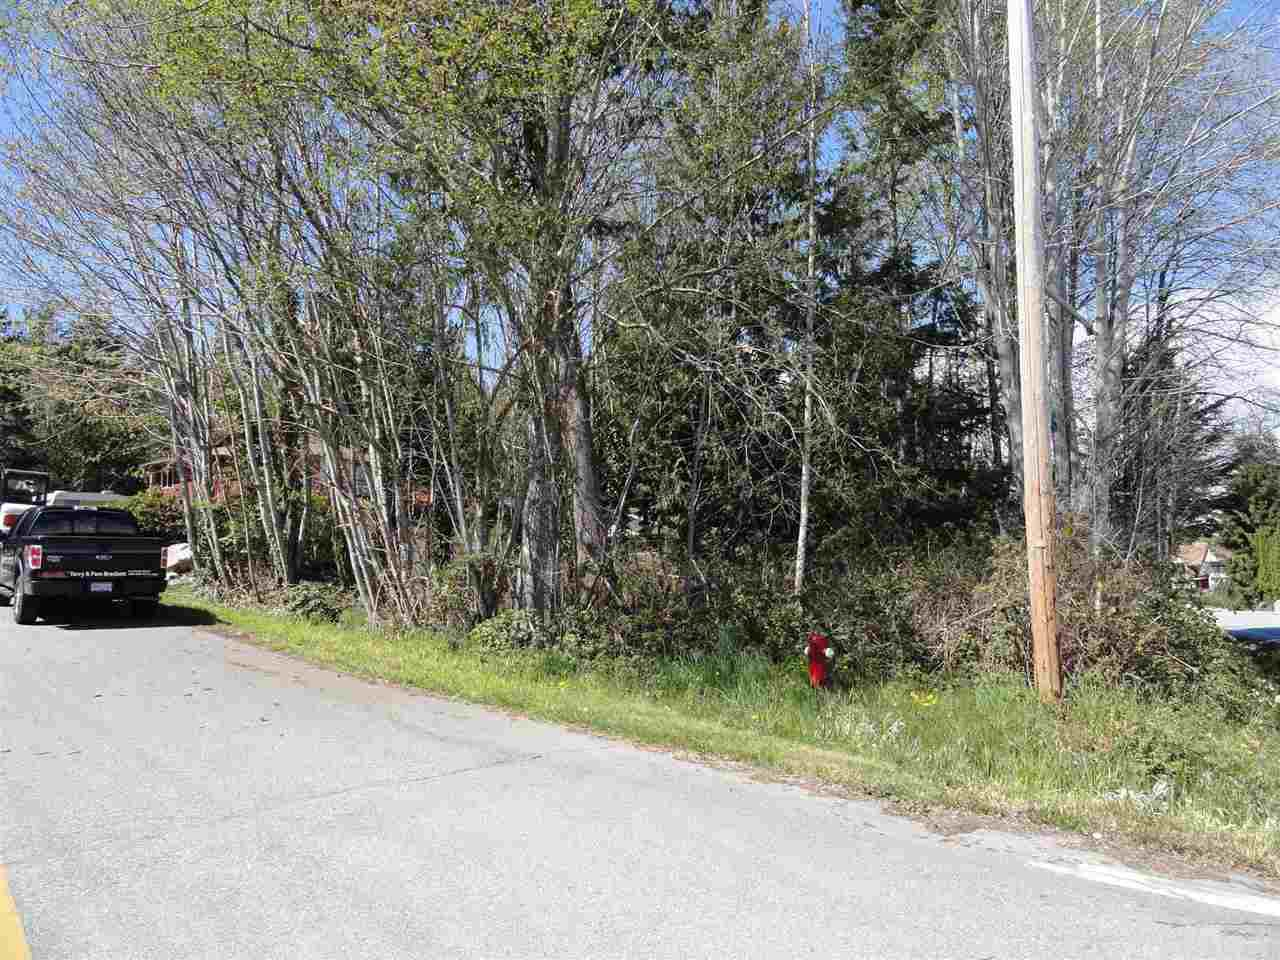 Photo 3: Photos: 6151 FAIRWAY Avenue in Sechelt: Sechelt District Land for sale (Sunshine Coast)  : MLS®# R2071827